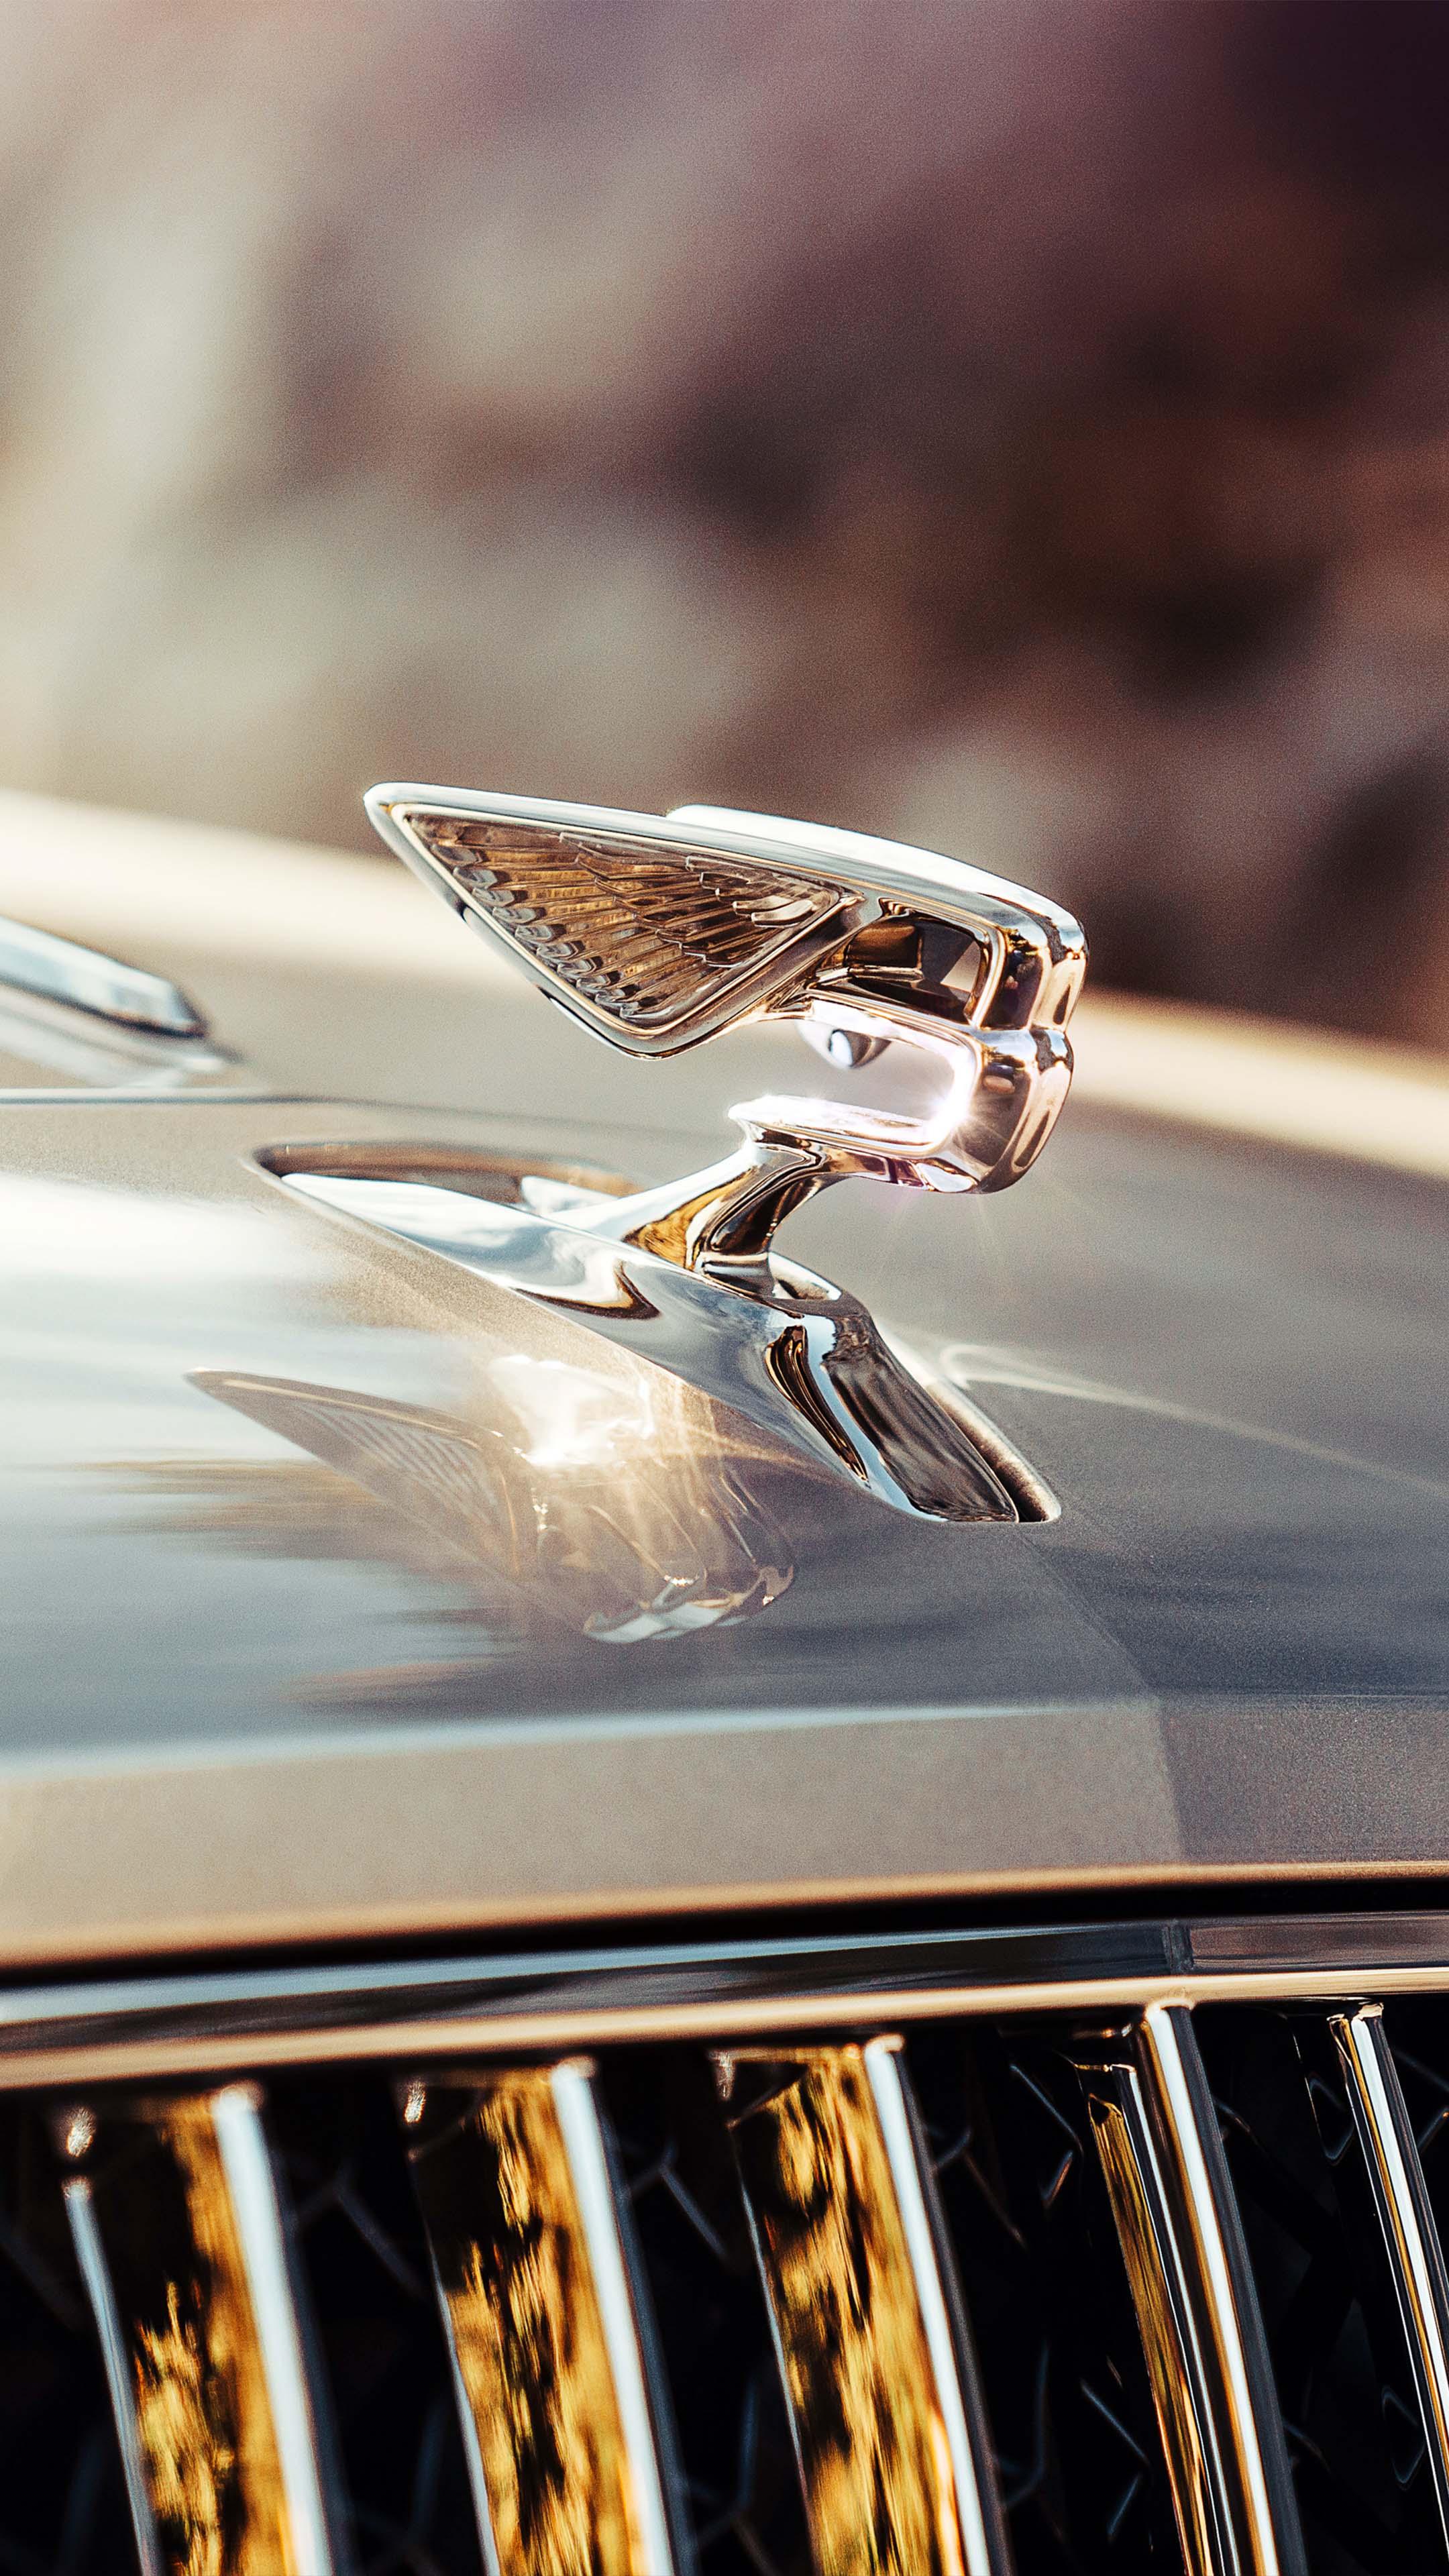 Bentley Flying Spur 2020 4K Ultra HD Mobile Wallpaper 2160x3840